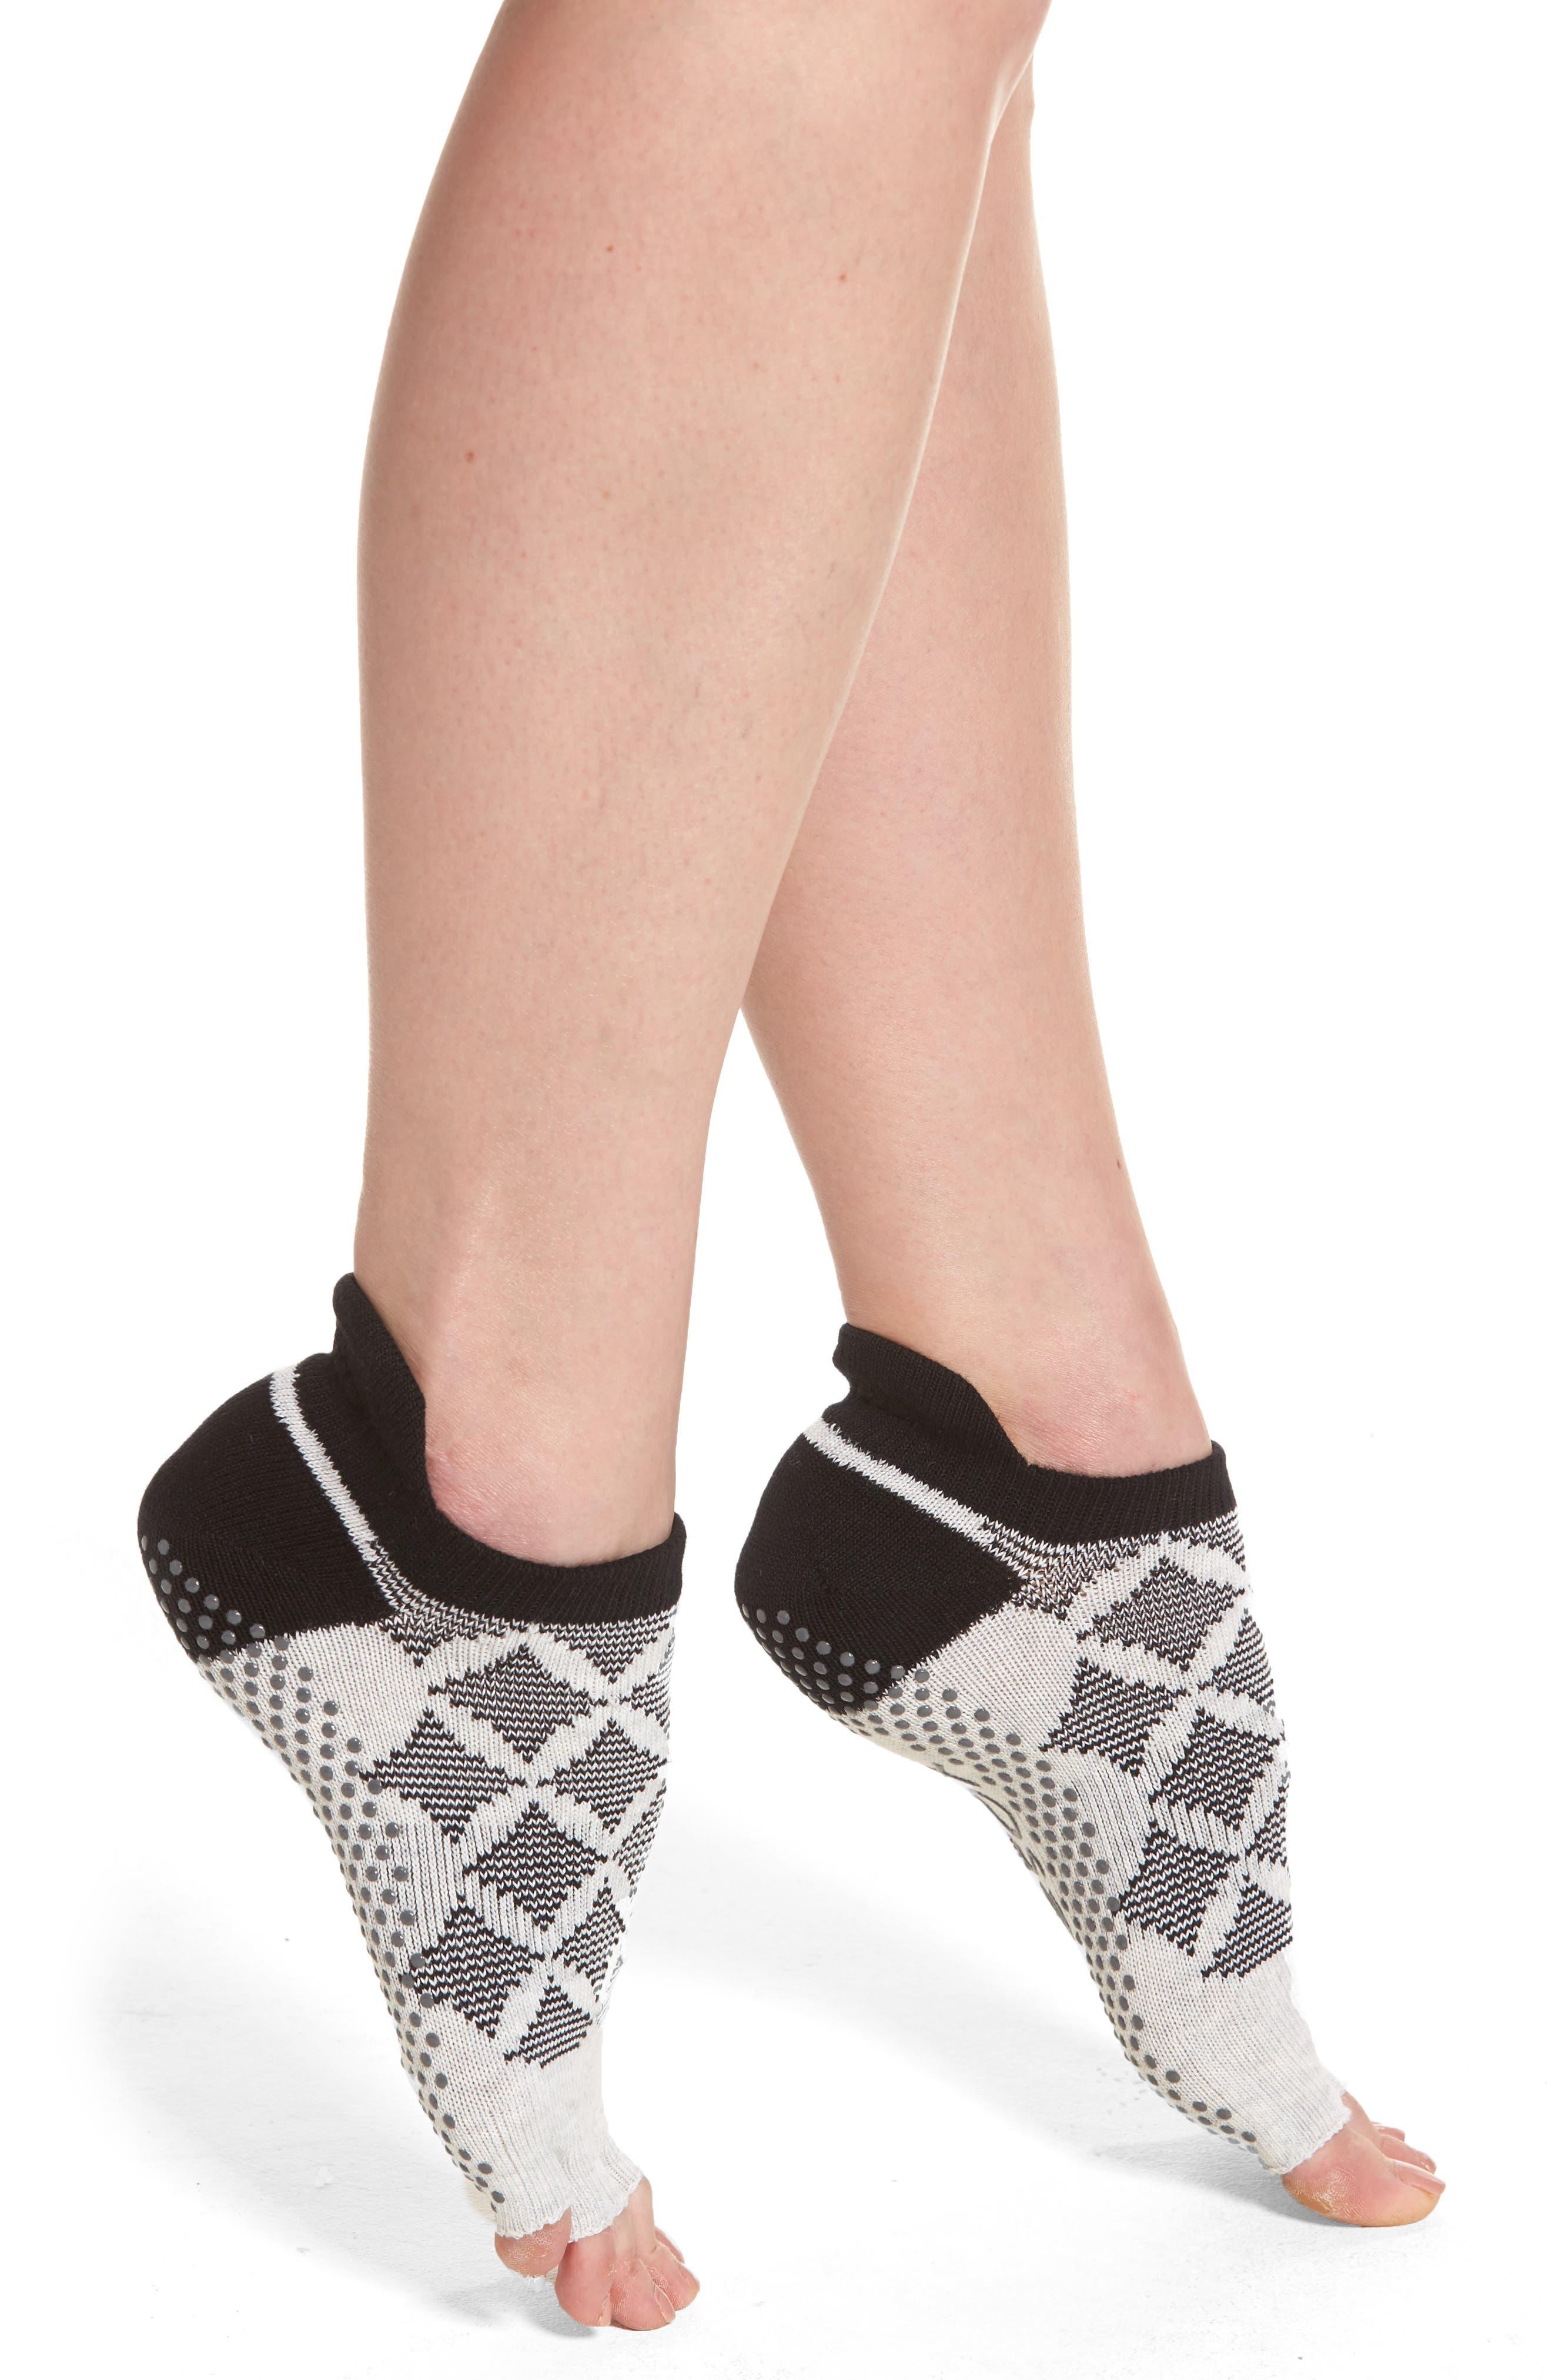 Main Image - ToeSox Low Rise Half Toe Gripper Socks